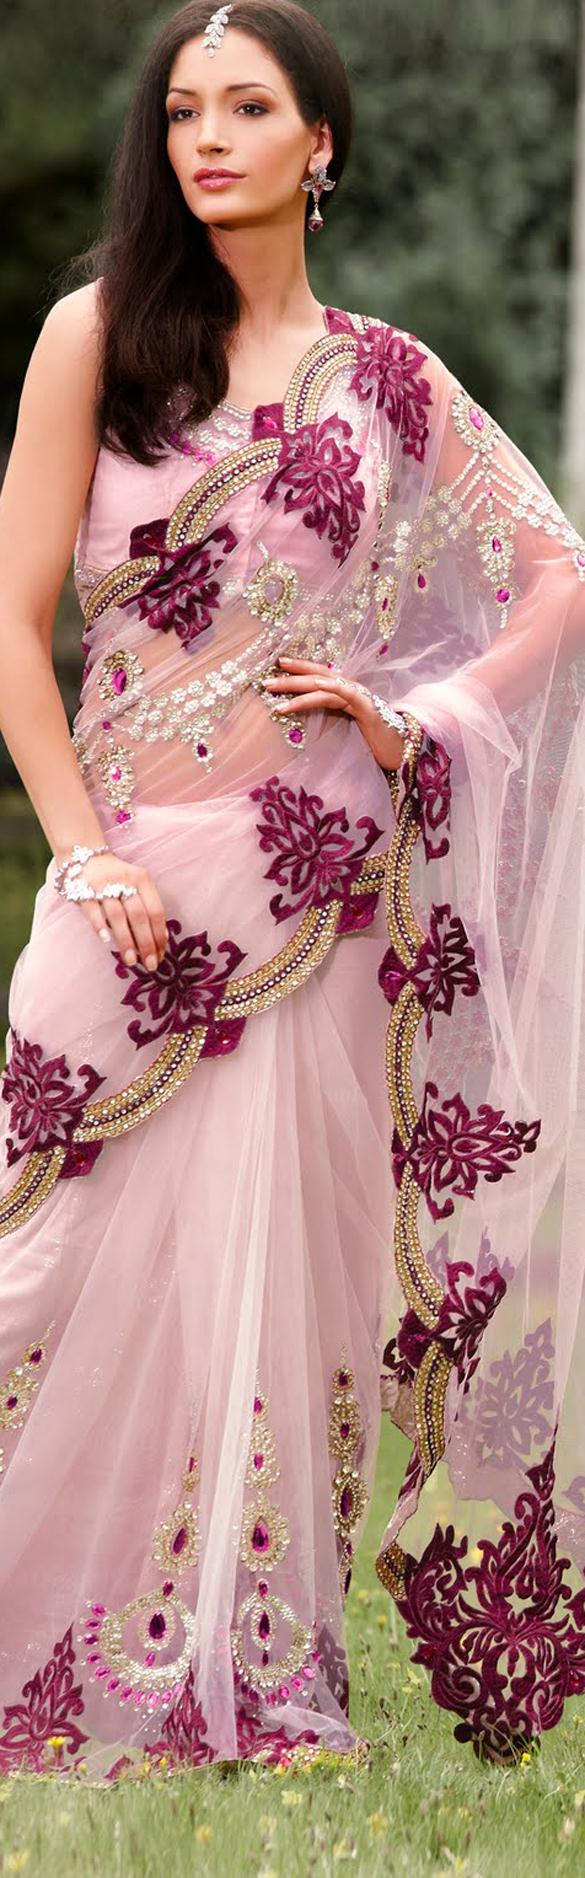 pink net saree   india style   Pinterest   Vestuarios, India y ...